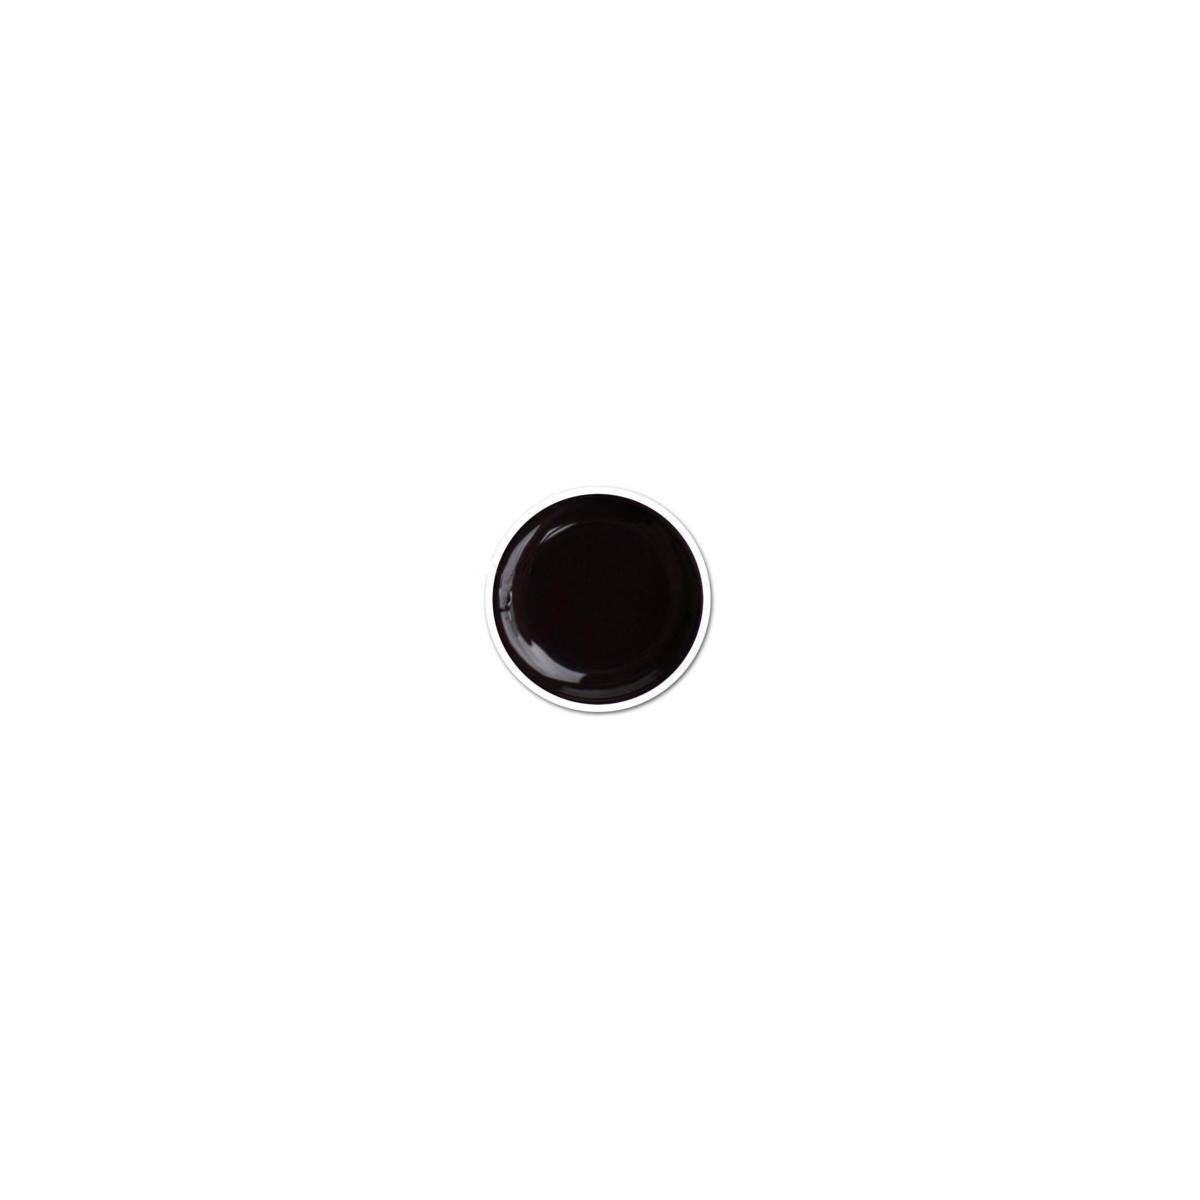 https://www.kit-manucure.com/881-thickbox_default/gel-uv-noir-5-ml.jpg